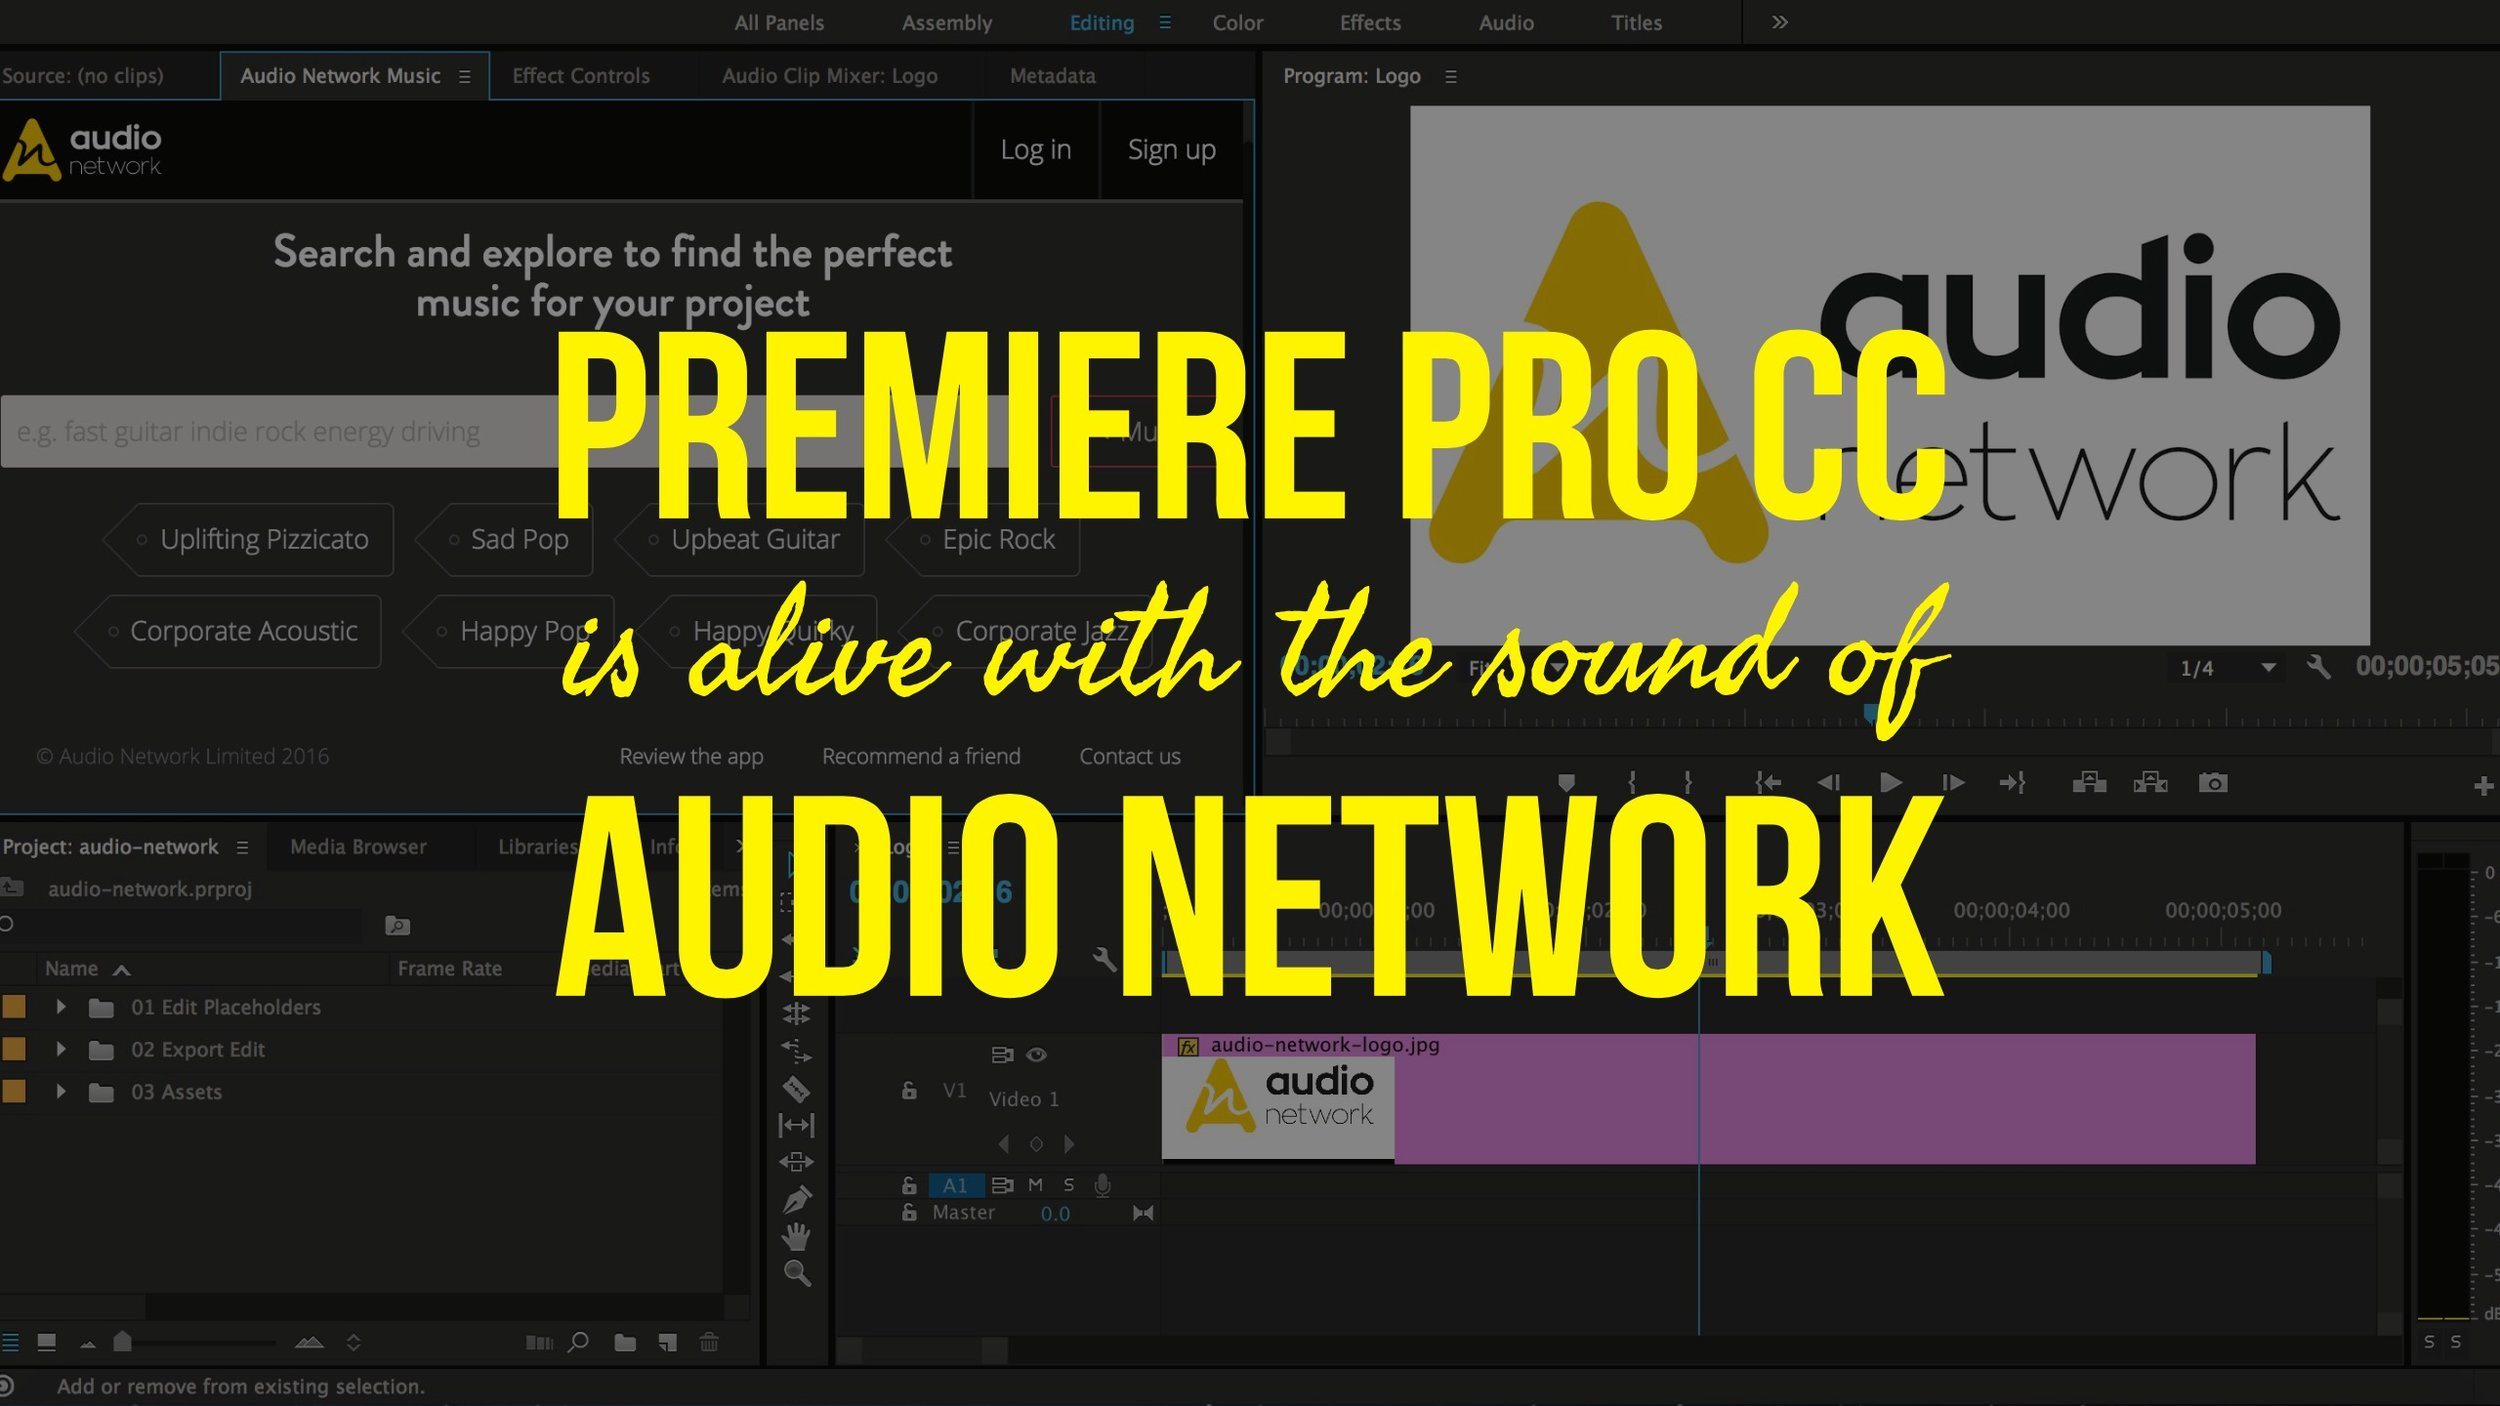 audio-newtork-panel-adobe-premiere-pro-cc.jpg